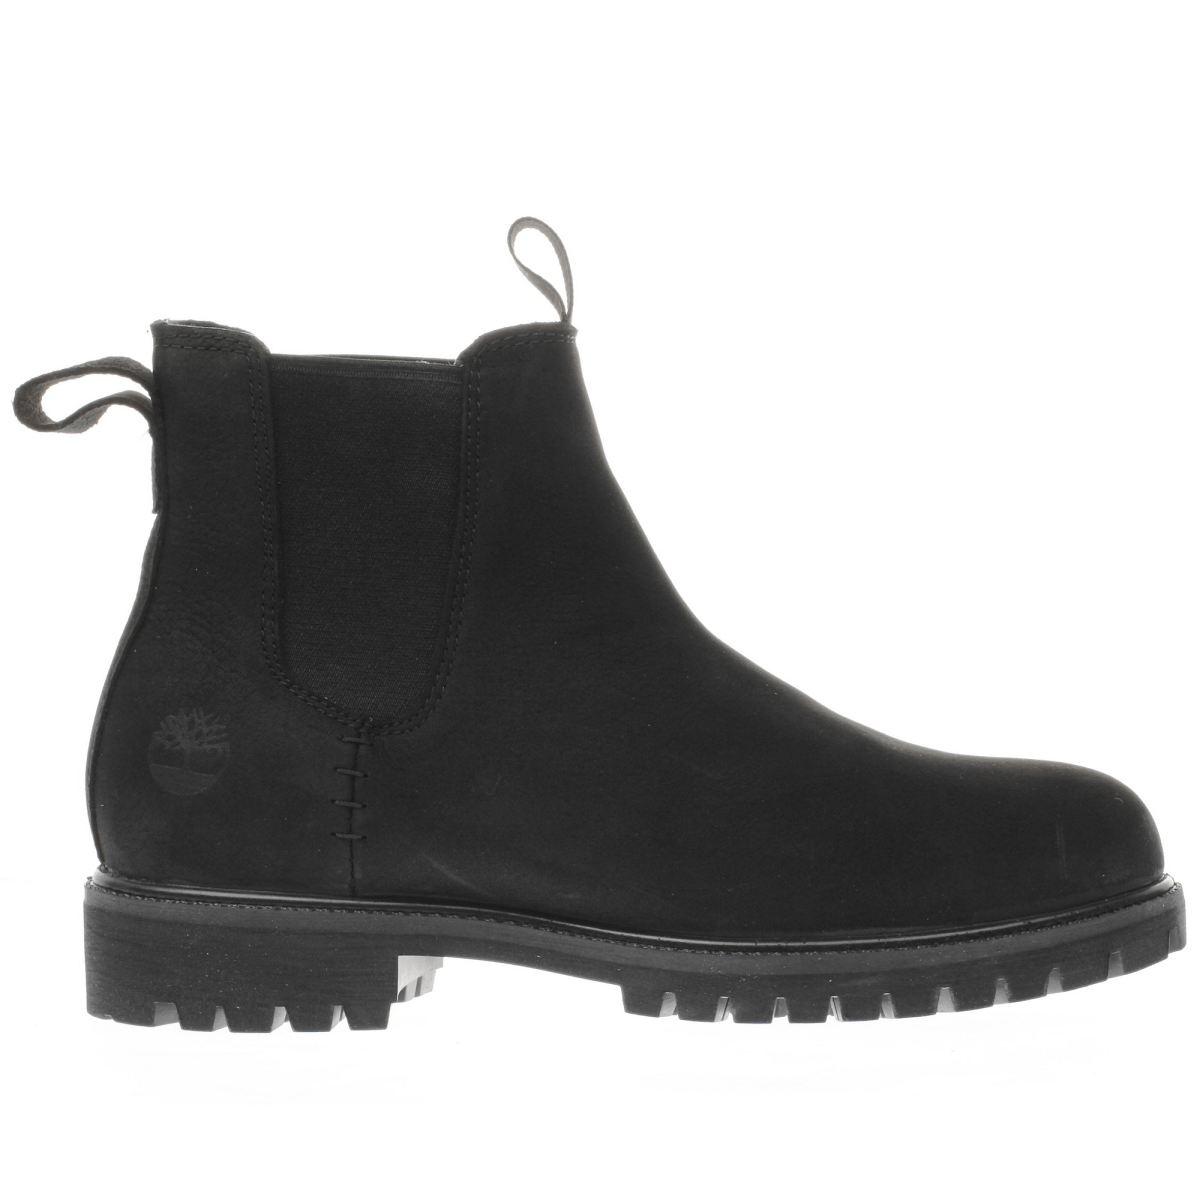 Timberland Black Premium Chelsea Boots